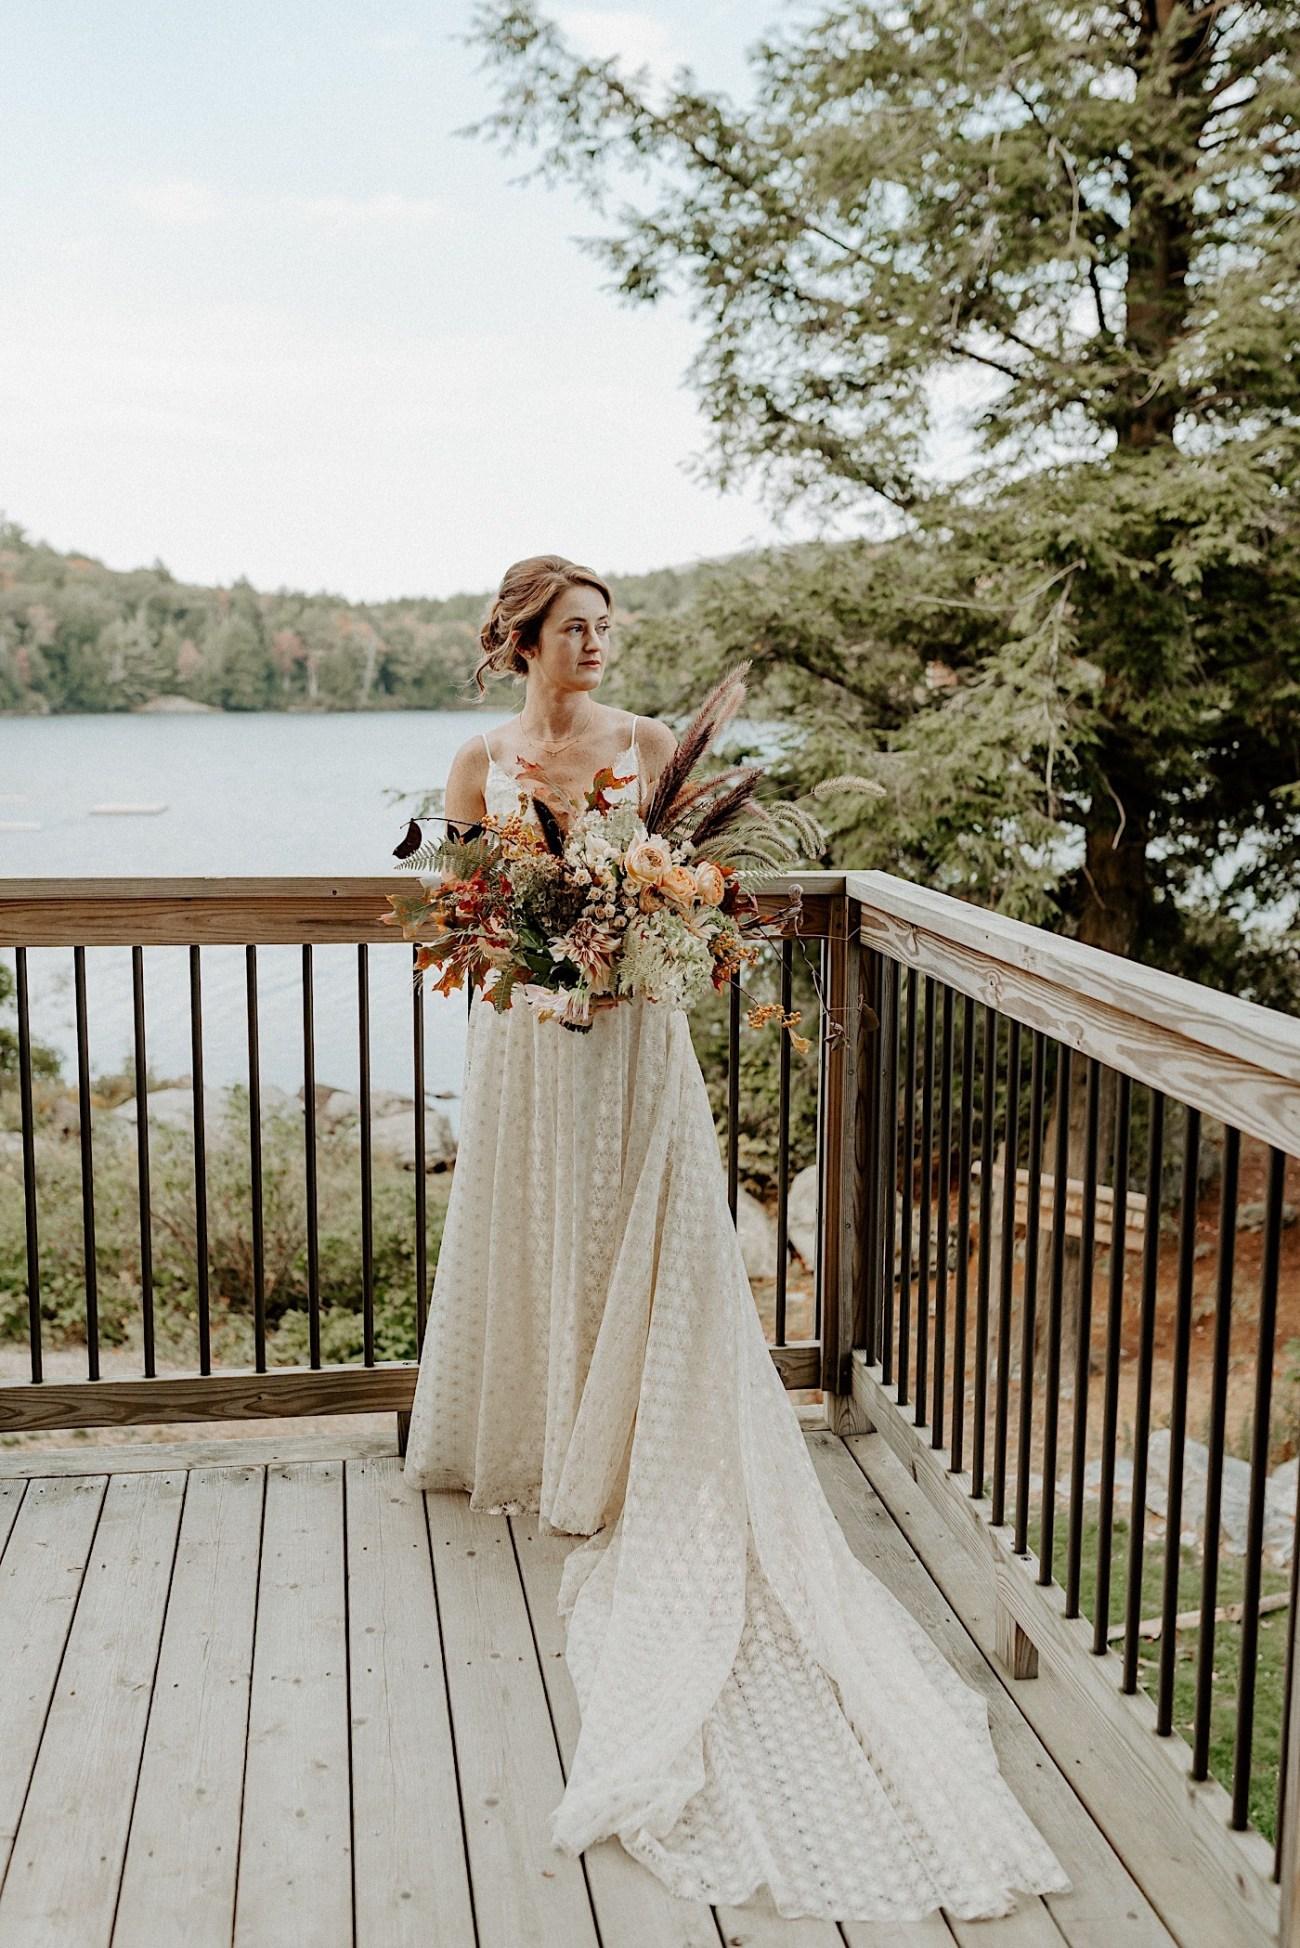 Destination Lakeside Wedding Mt Washington Wedding Outdoor Wedding Boston Wedding Photographer 016